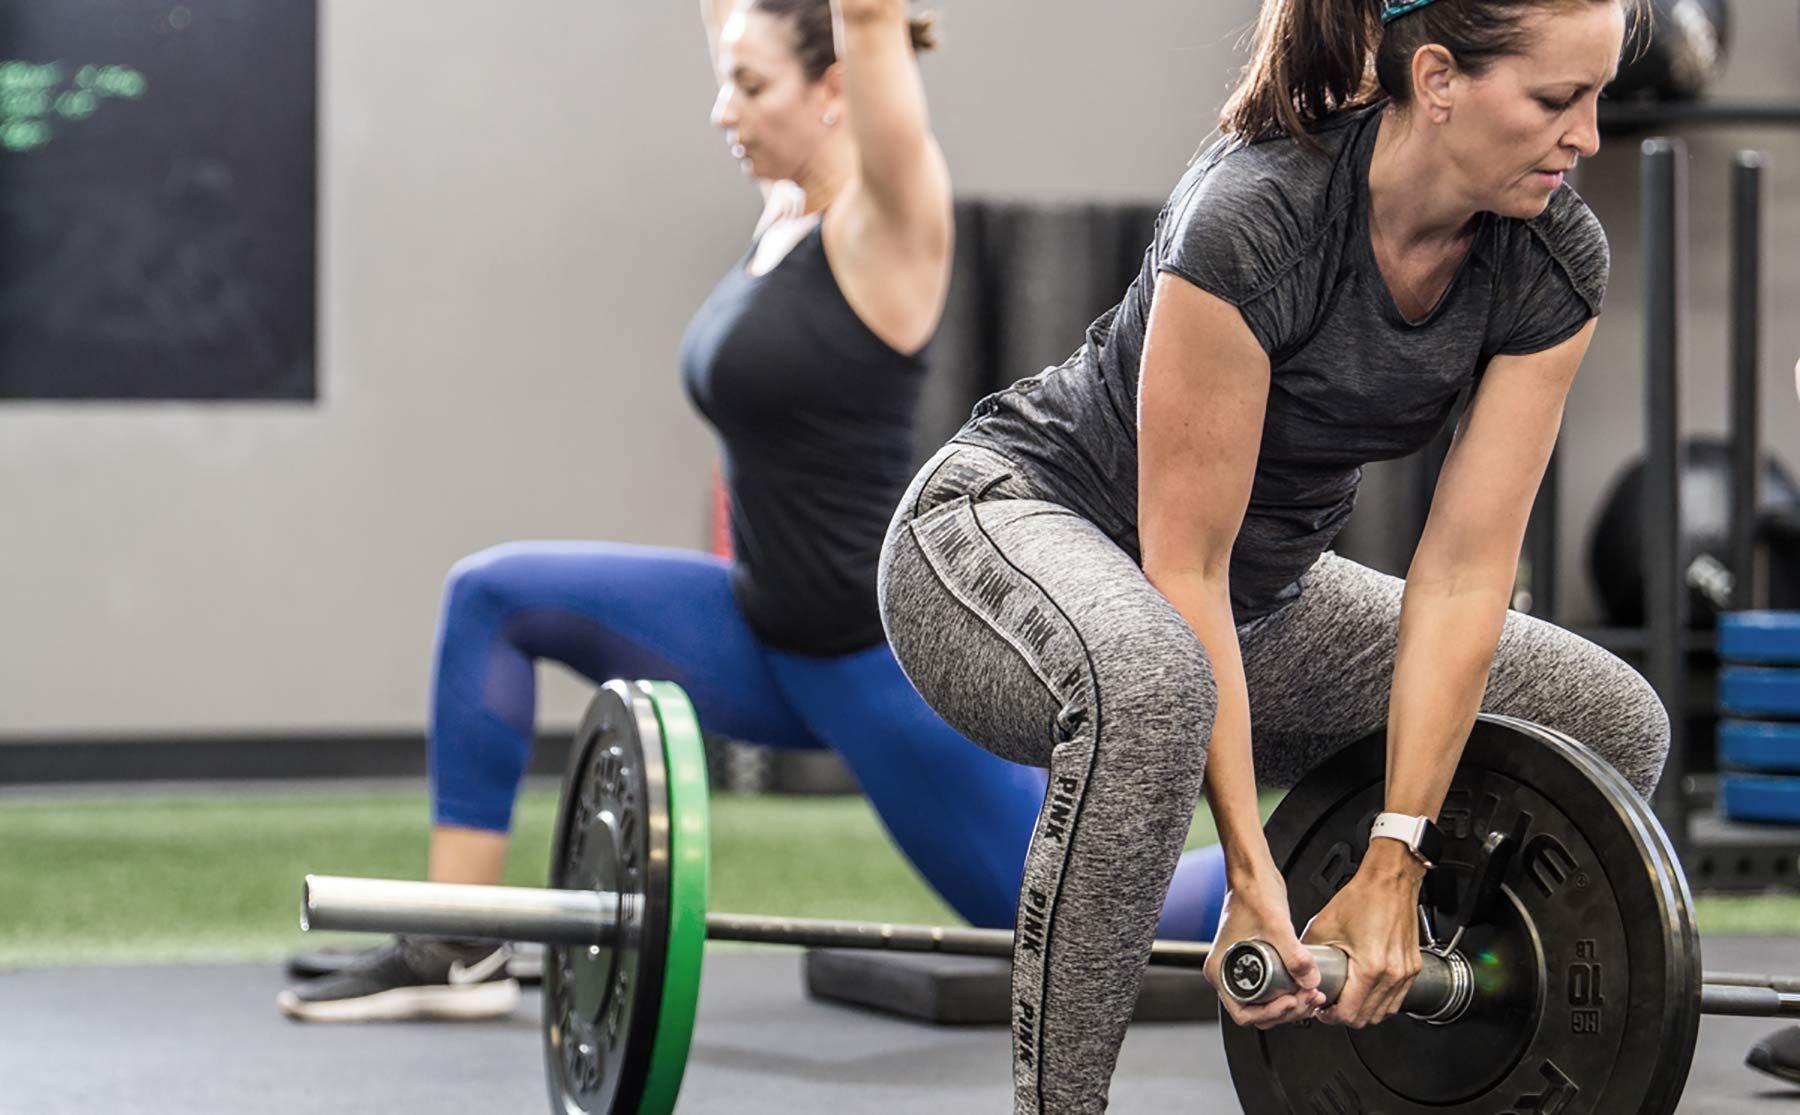 la fitness personal trainer salary reddit